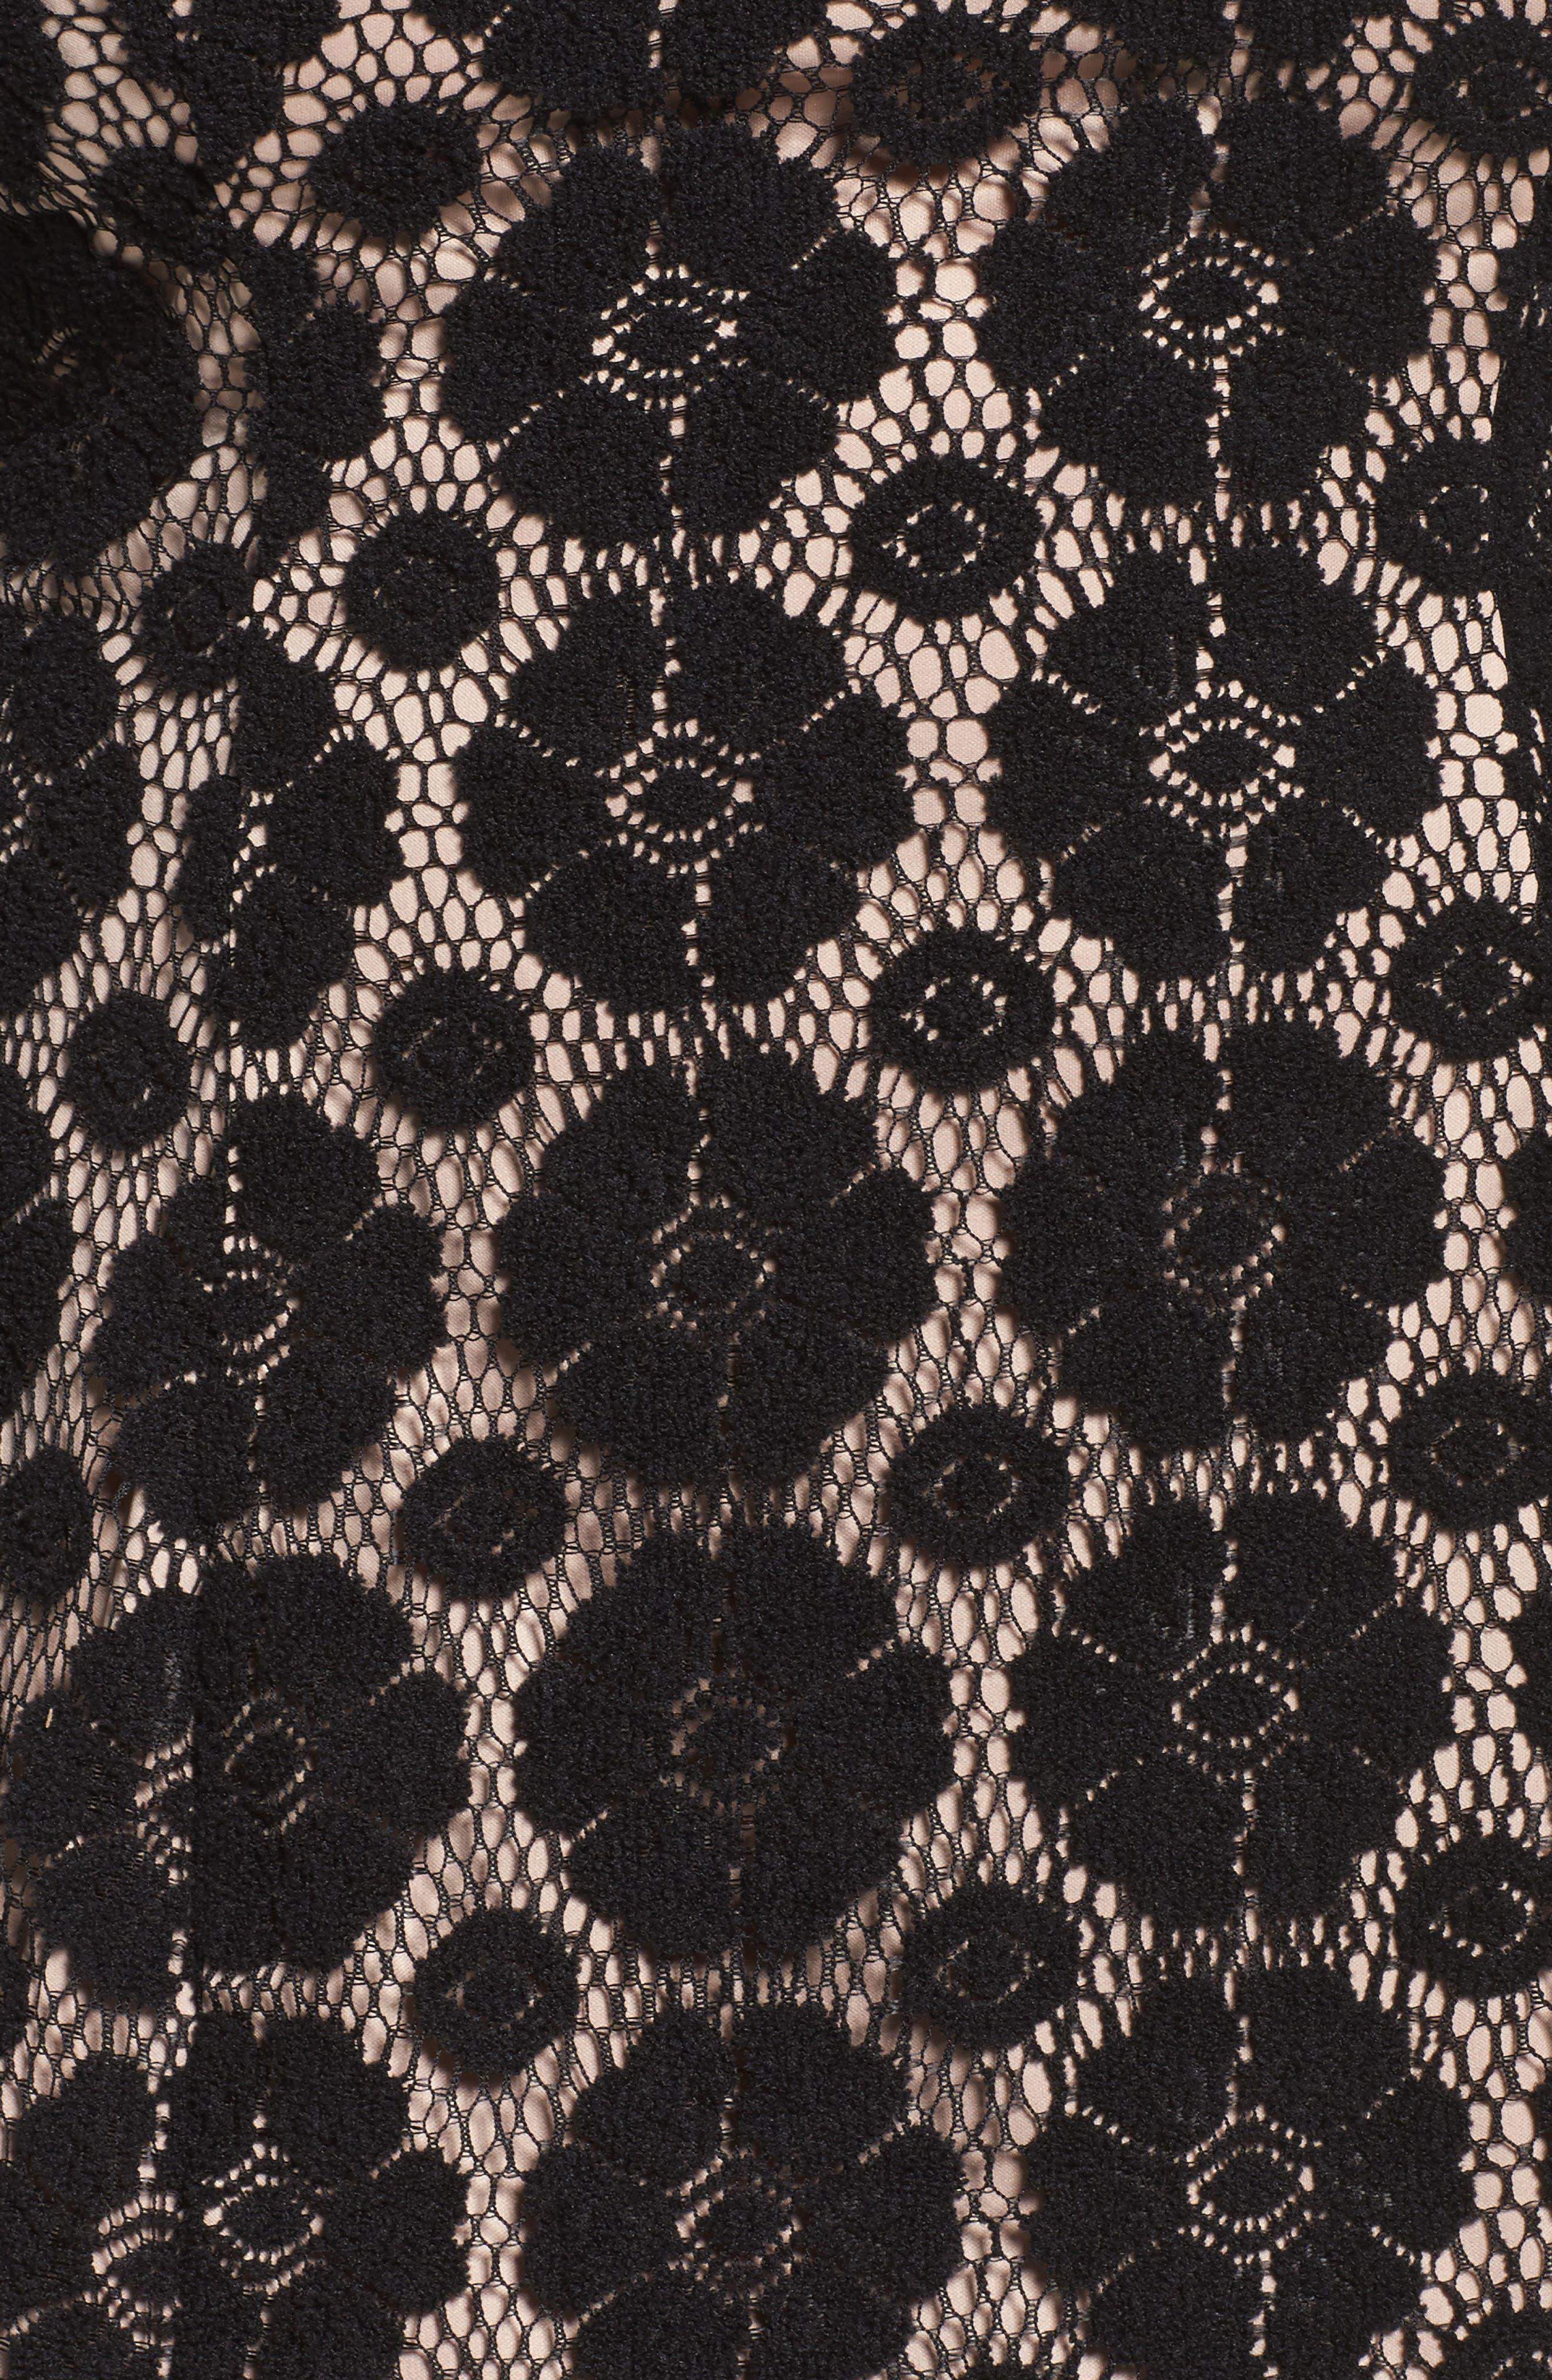 Textured Floral Lace Shift Dress,                             Alternate thumbnail 5, color,